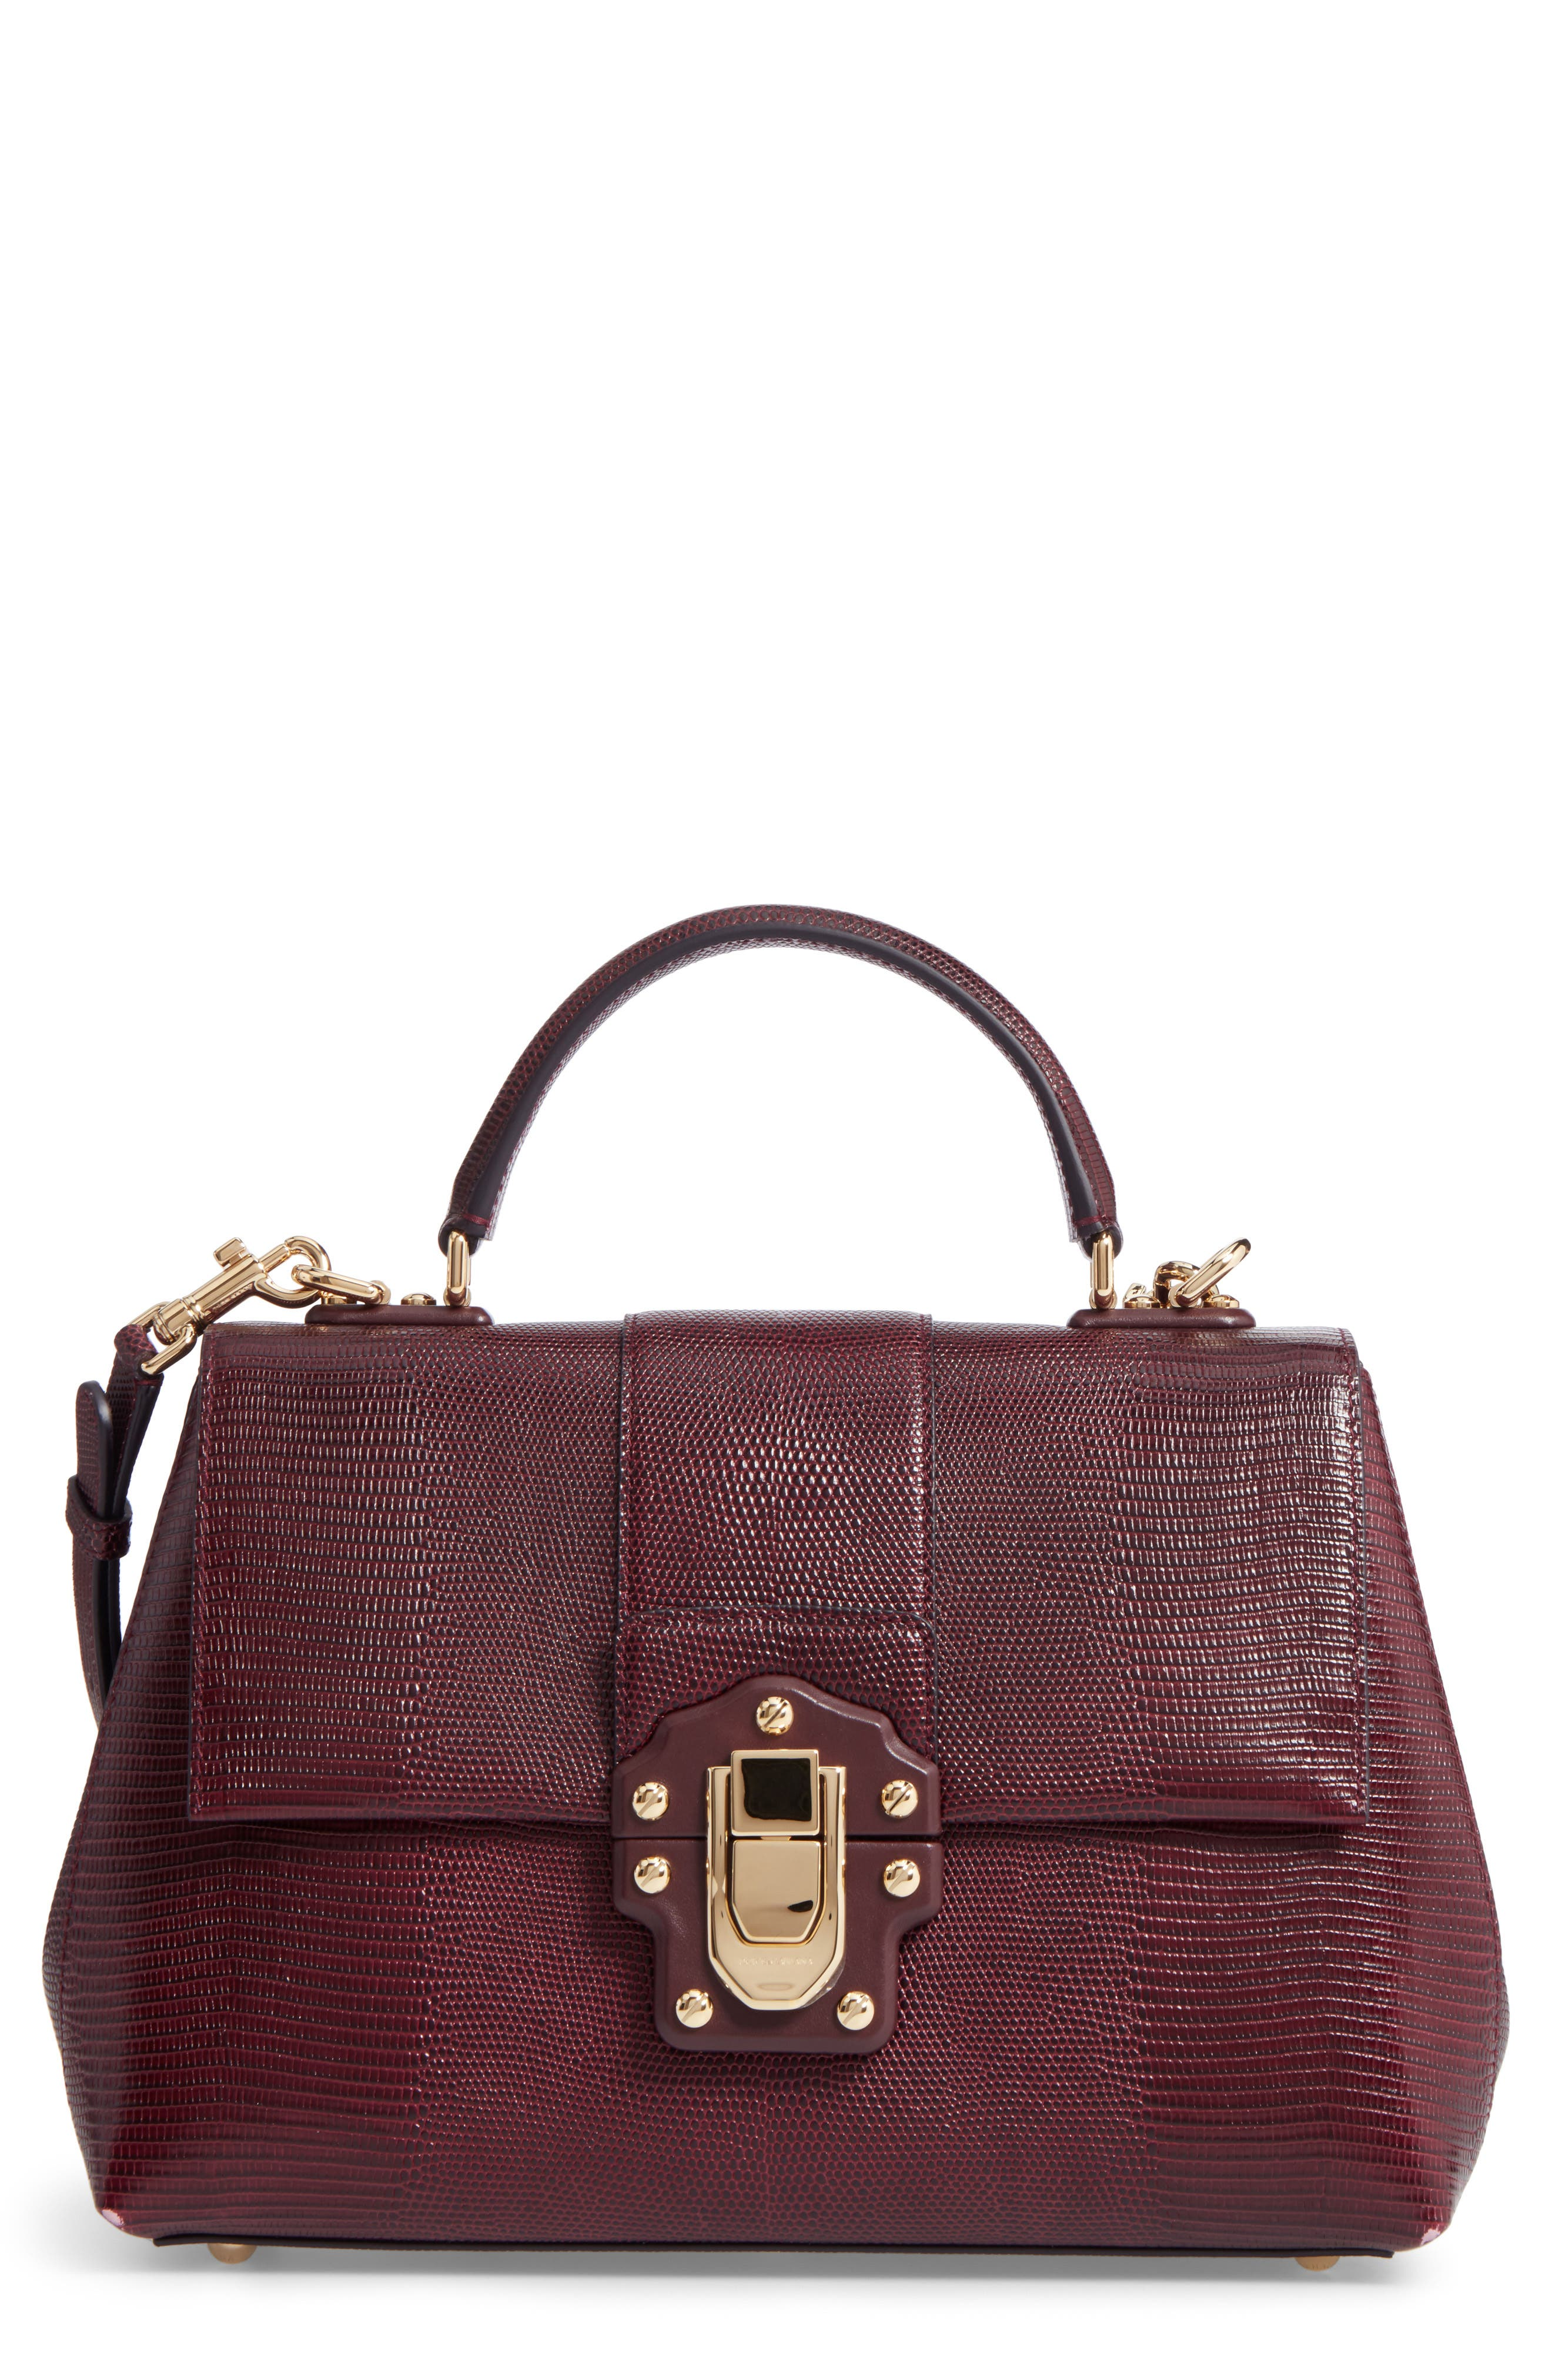 Dolce&Gabbana Medium Lucia Leather Satchel